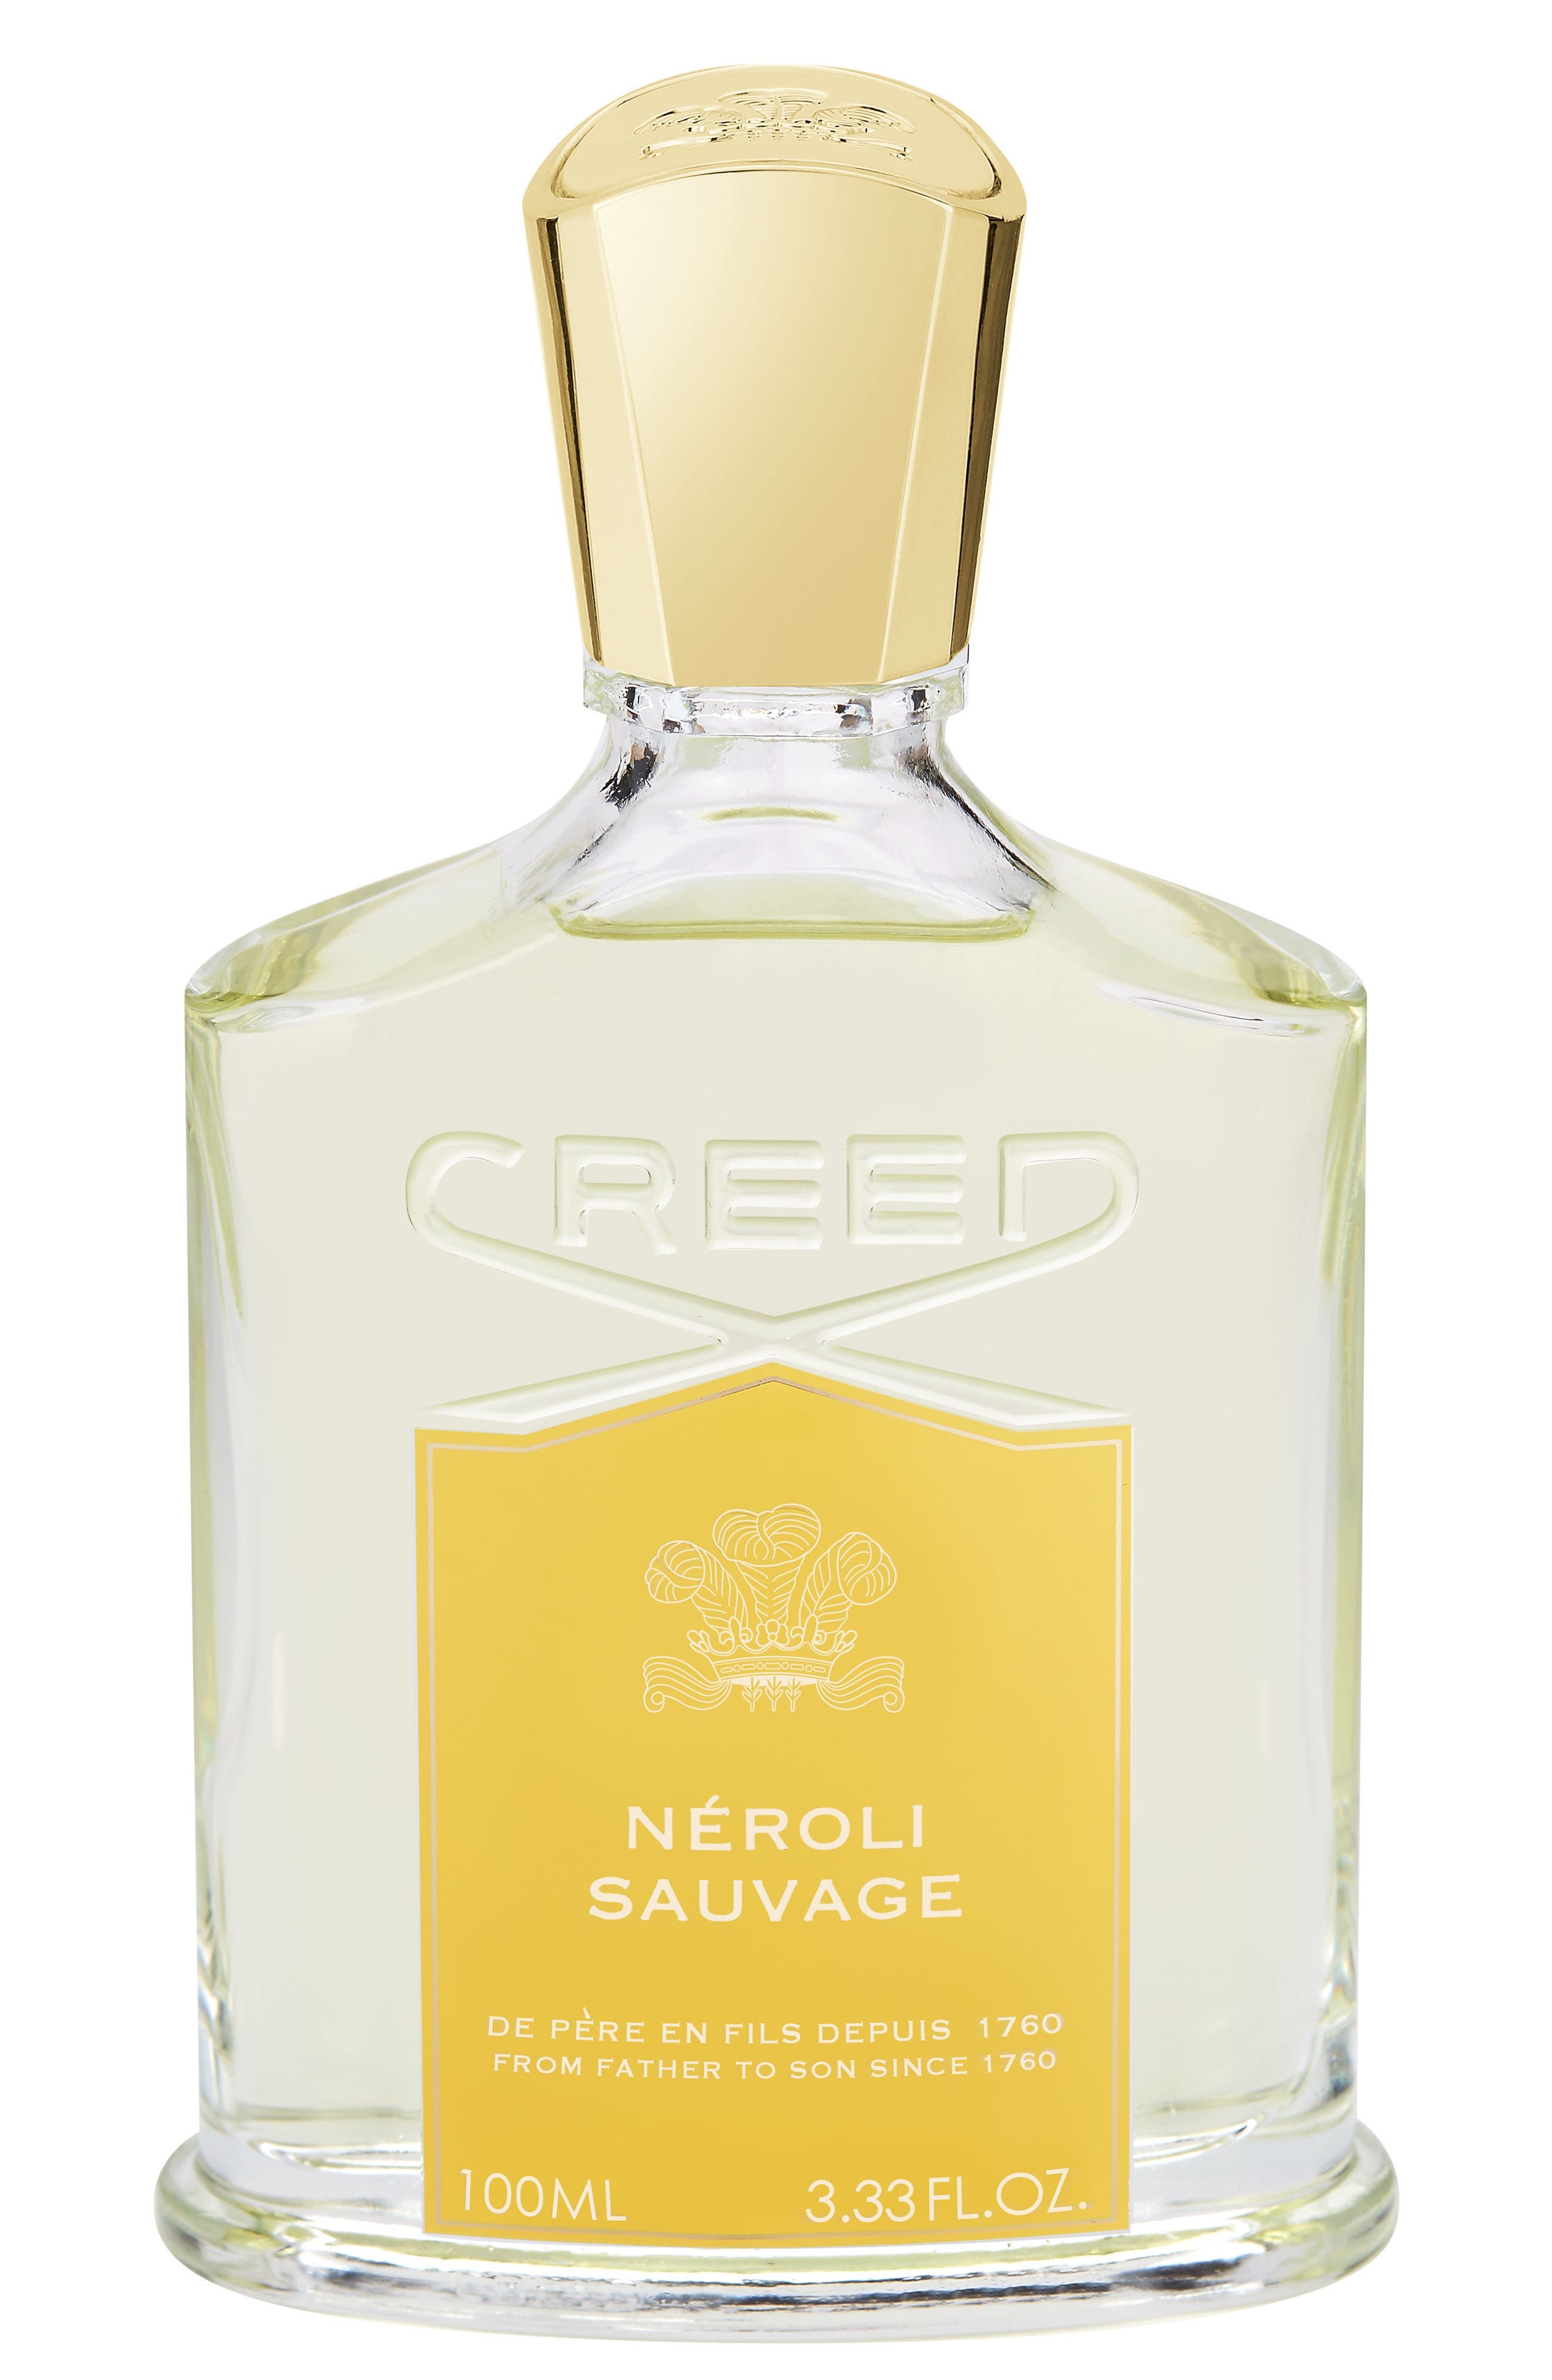 Neroli Sauvage Fragrance